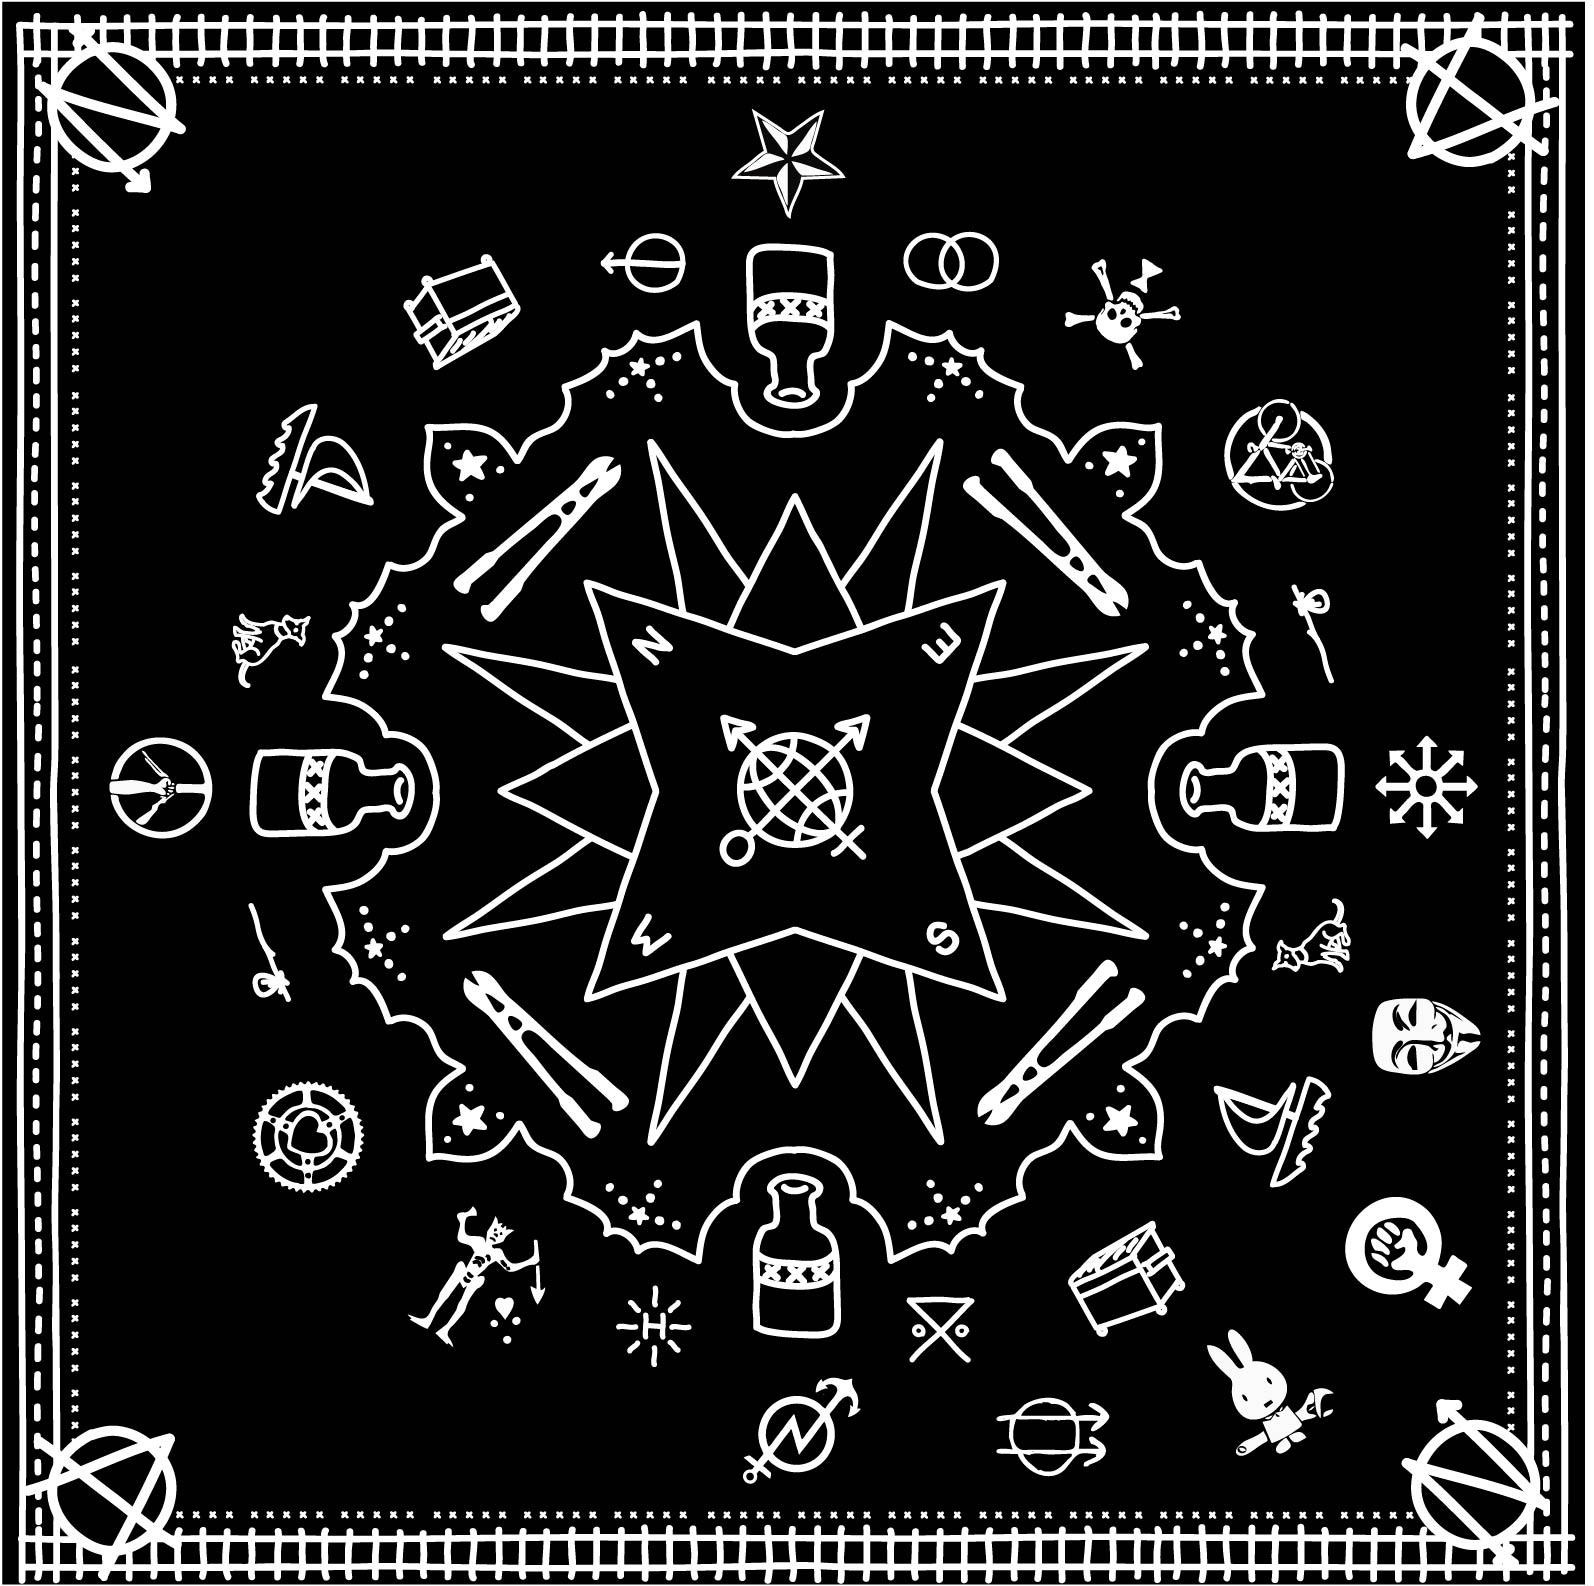 Bandkerchief_StPv2.jpg